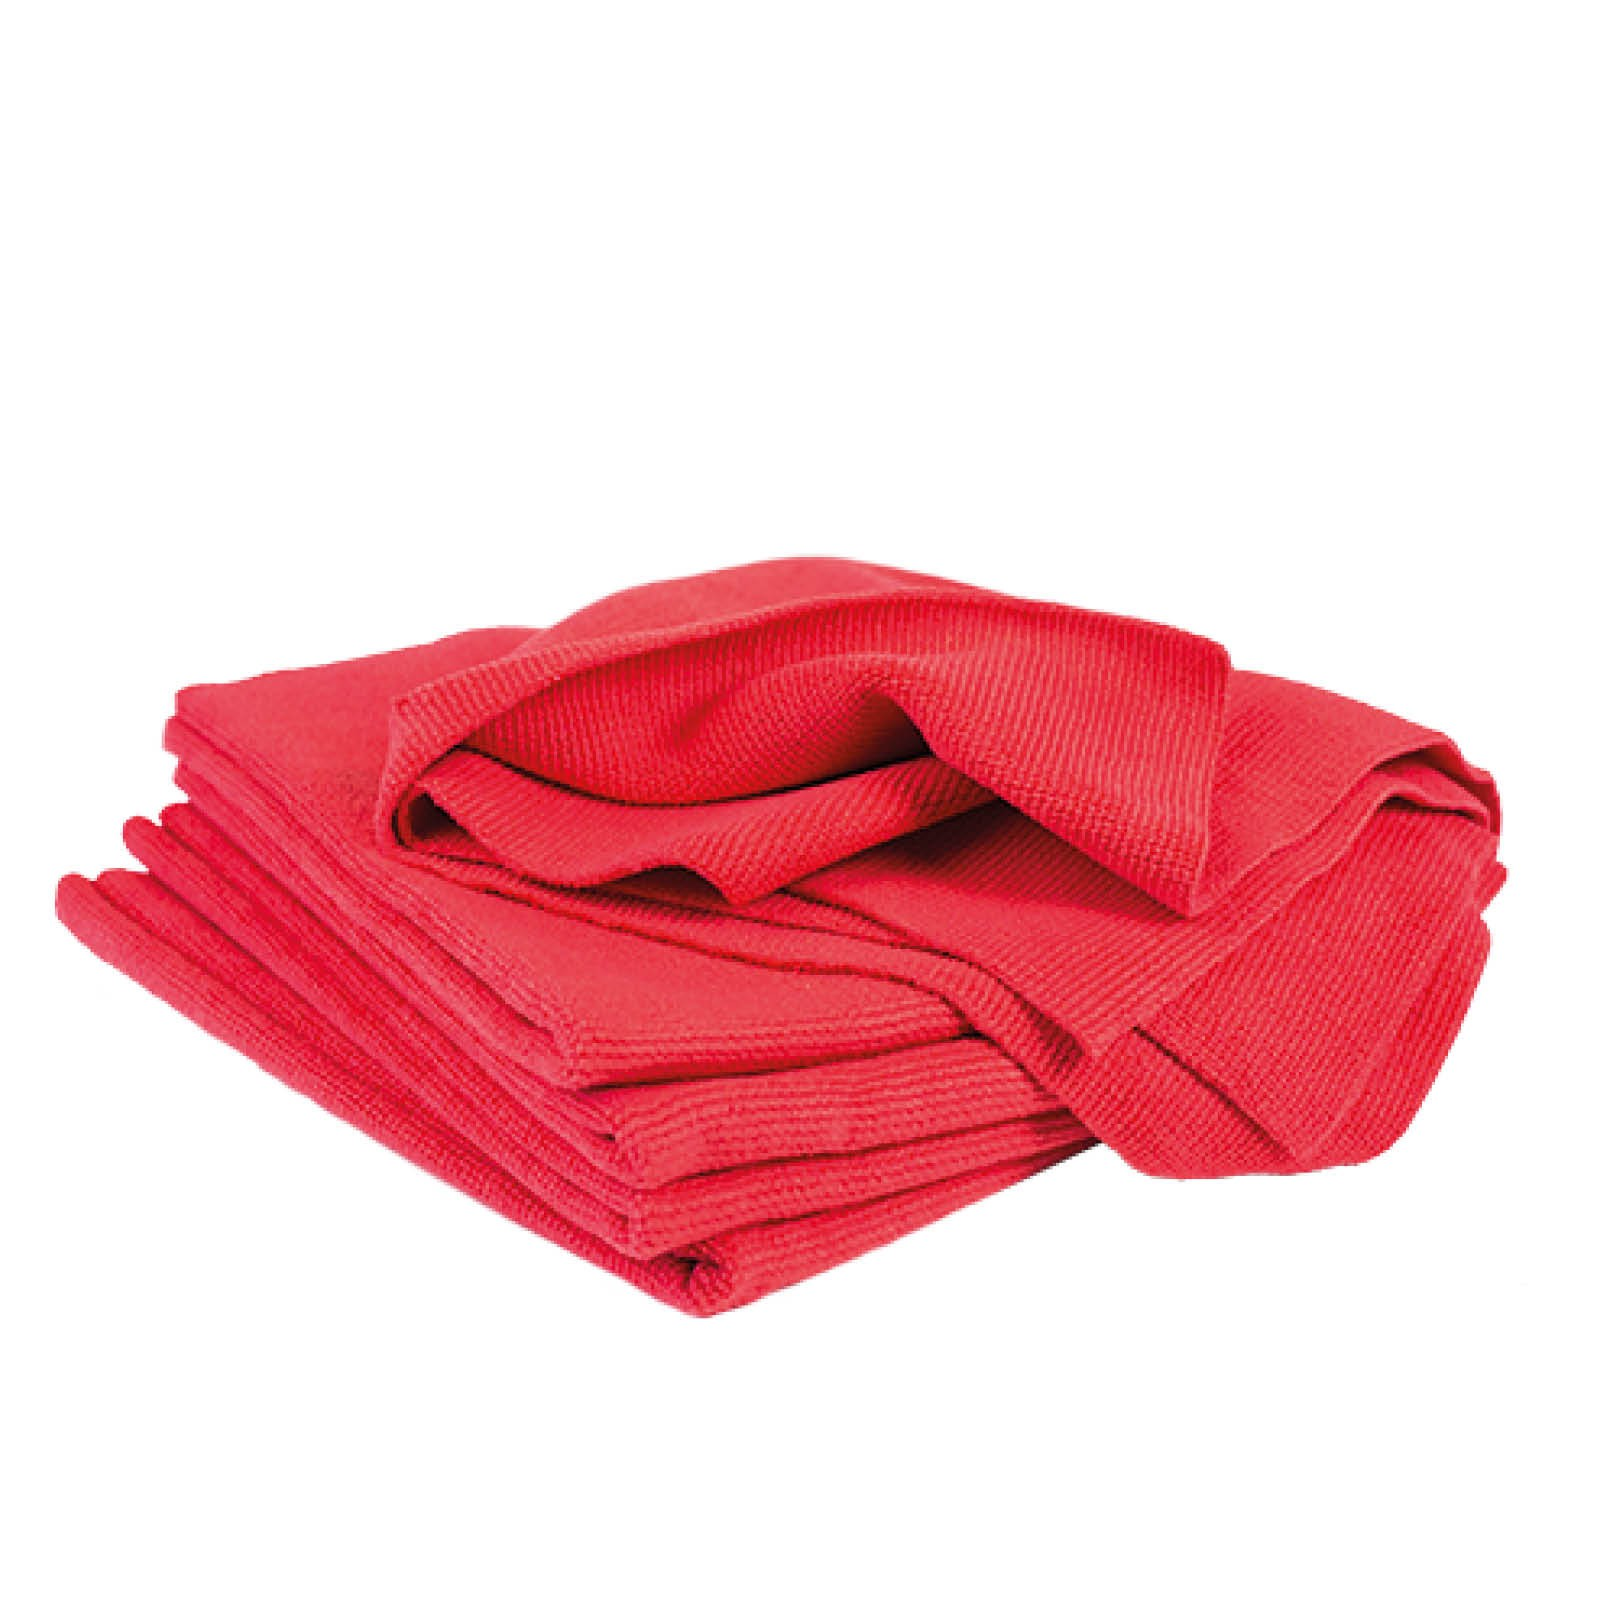 Microfiber Ultra-Soft Cloth - Red